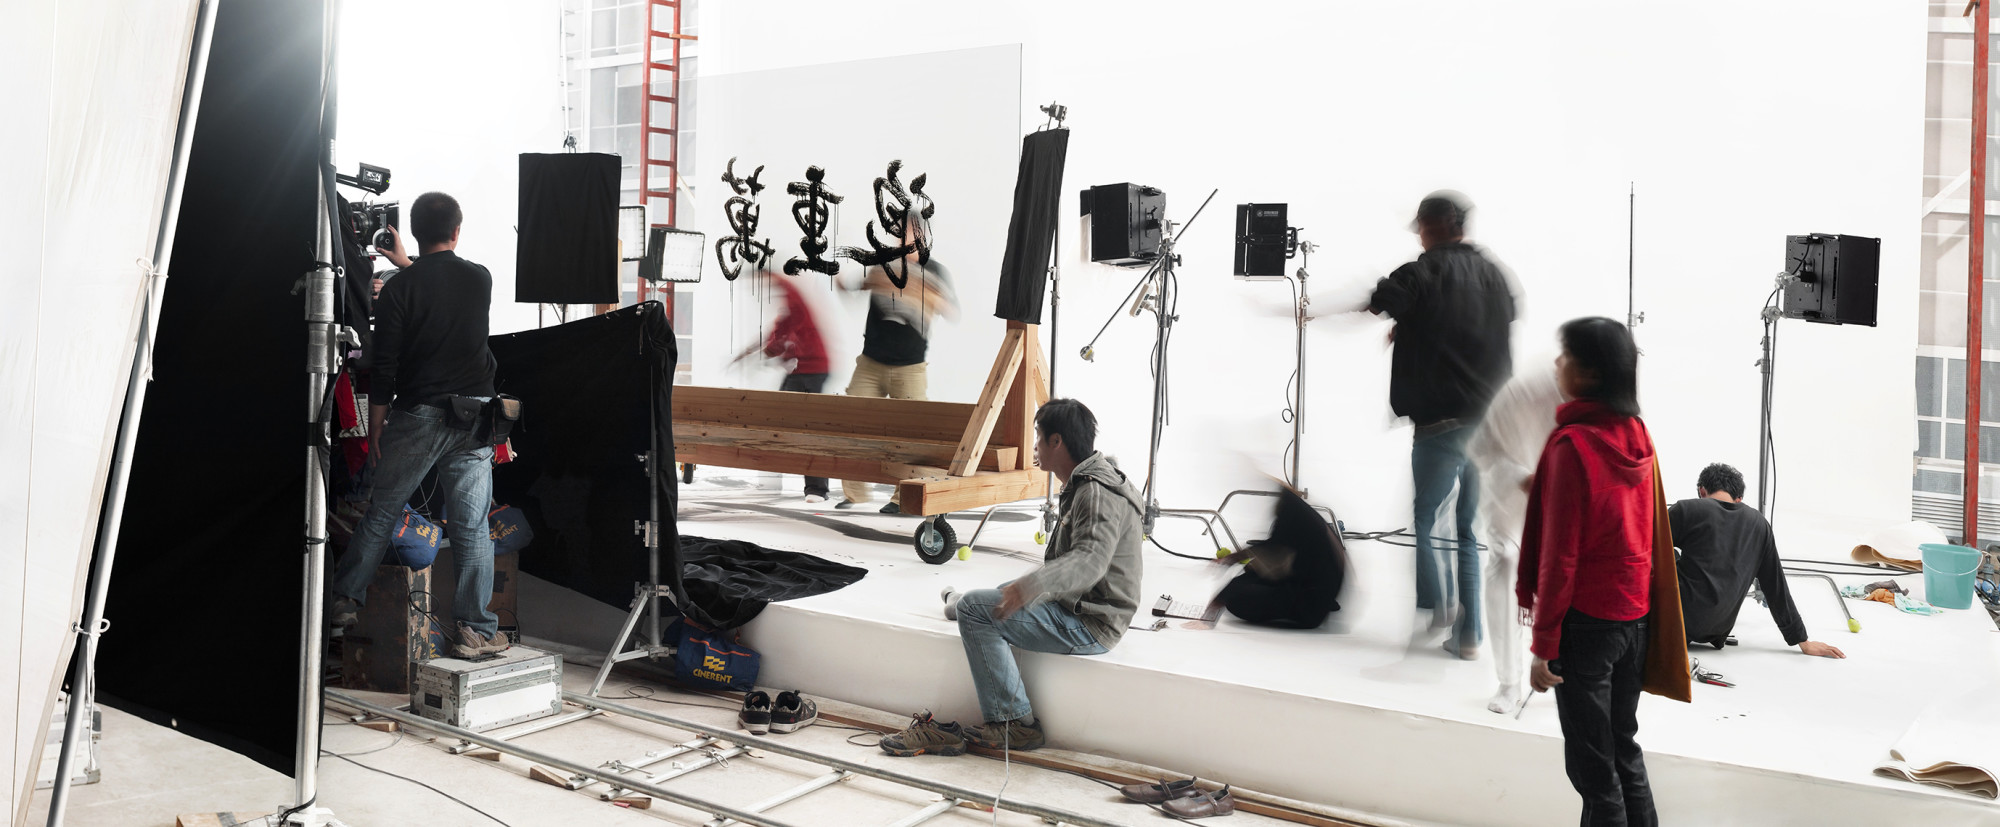 Isaac Julien, Mise-en-scène (Ten Thousand Waves), 2010